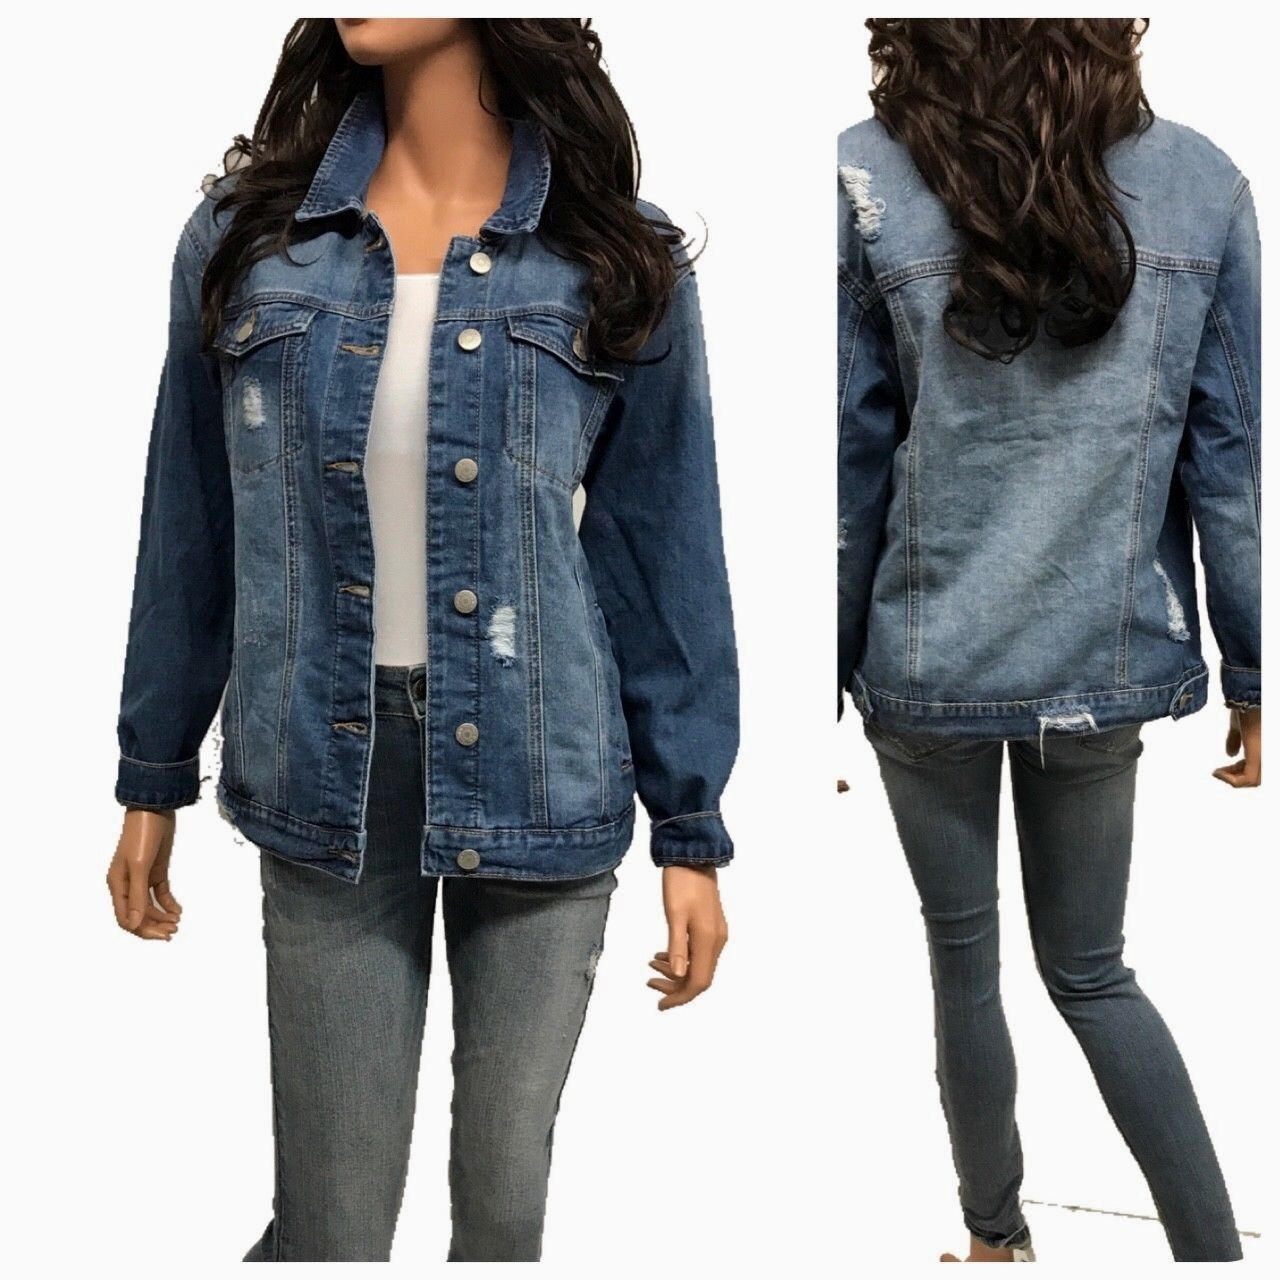 Women's Causal  Long Sleeve  Loose Fit Denim Jean Jacket